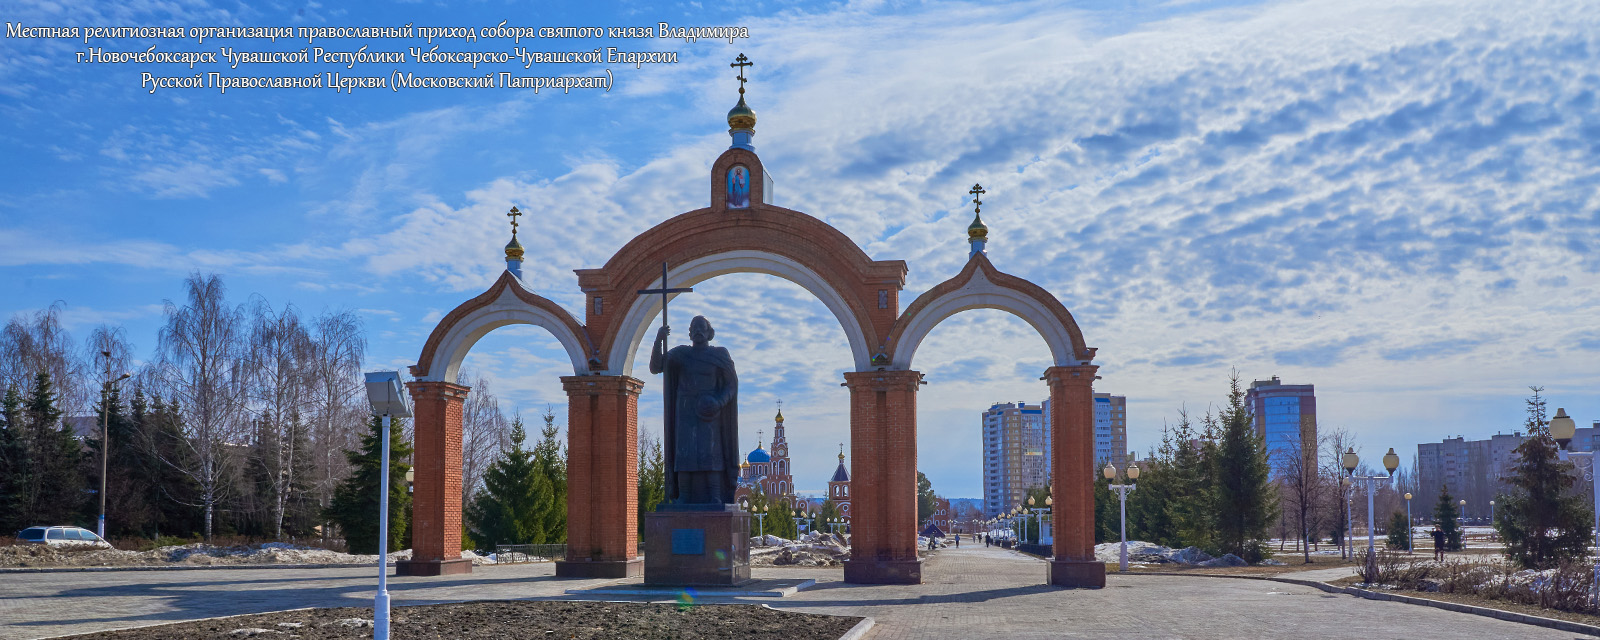 Собор святого князя Владимира